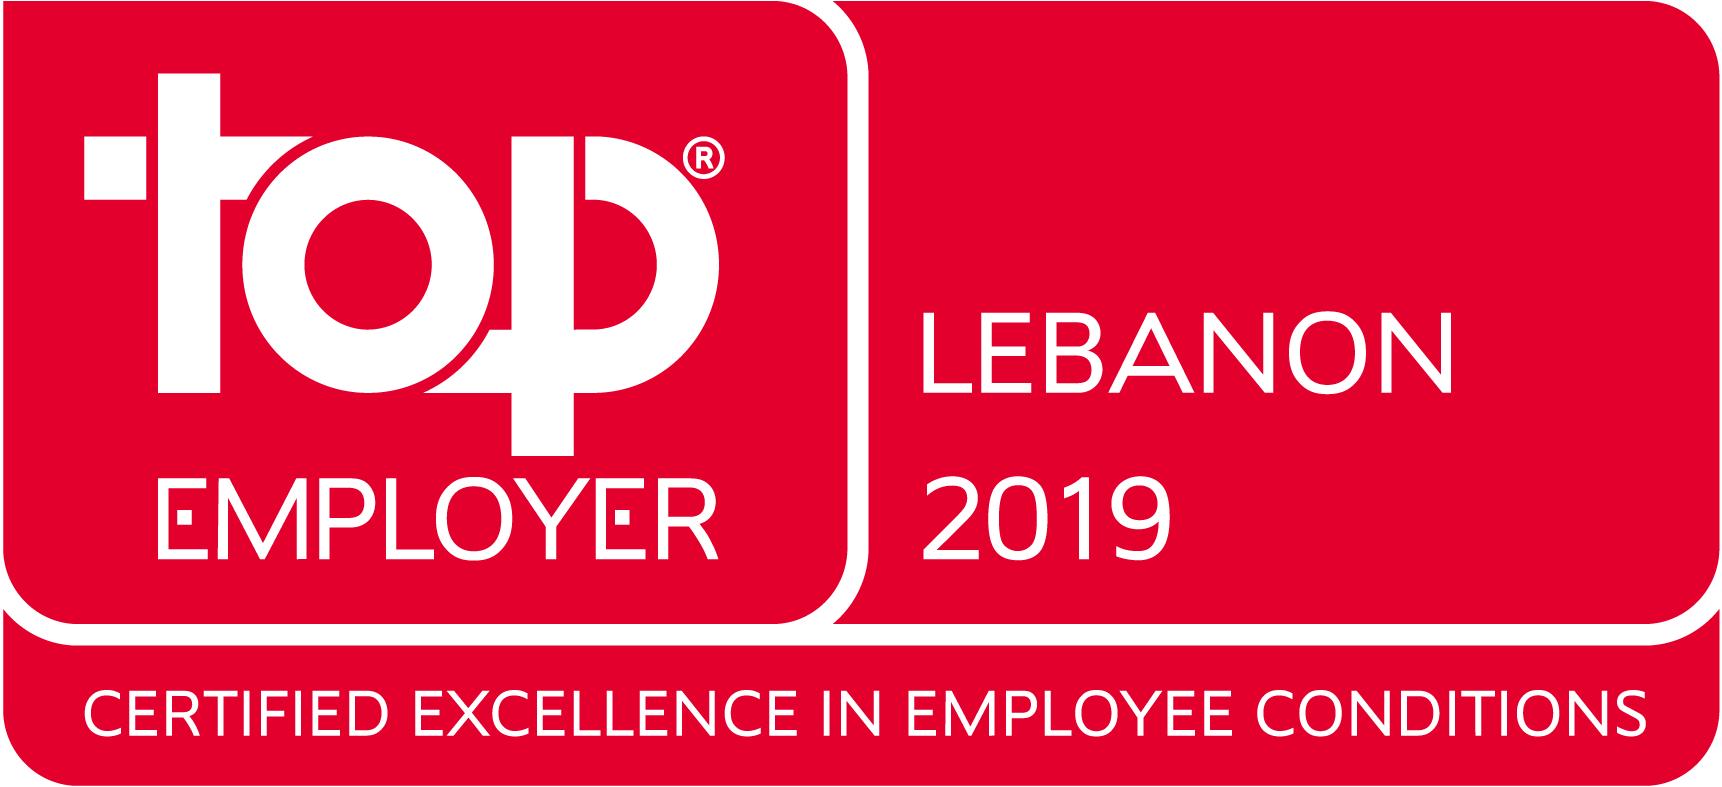 Top_Employer_Lebanon_English_2019